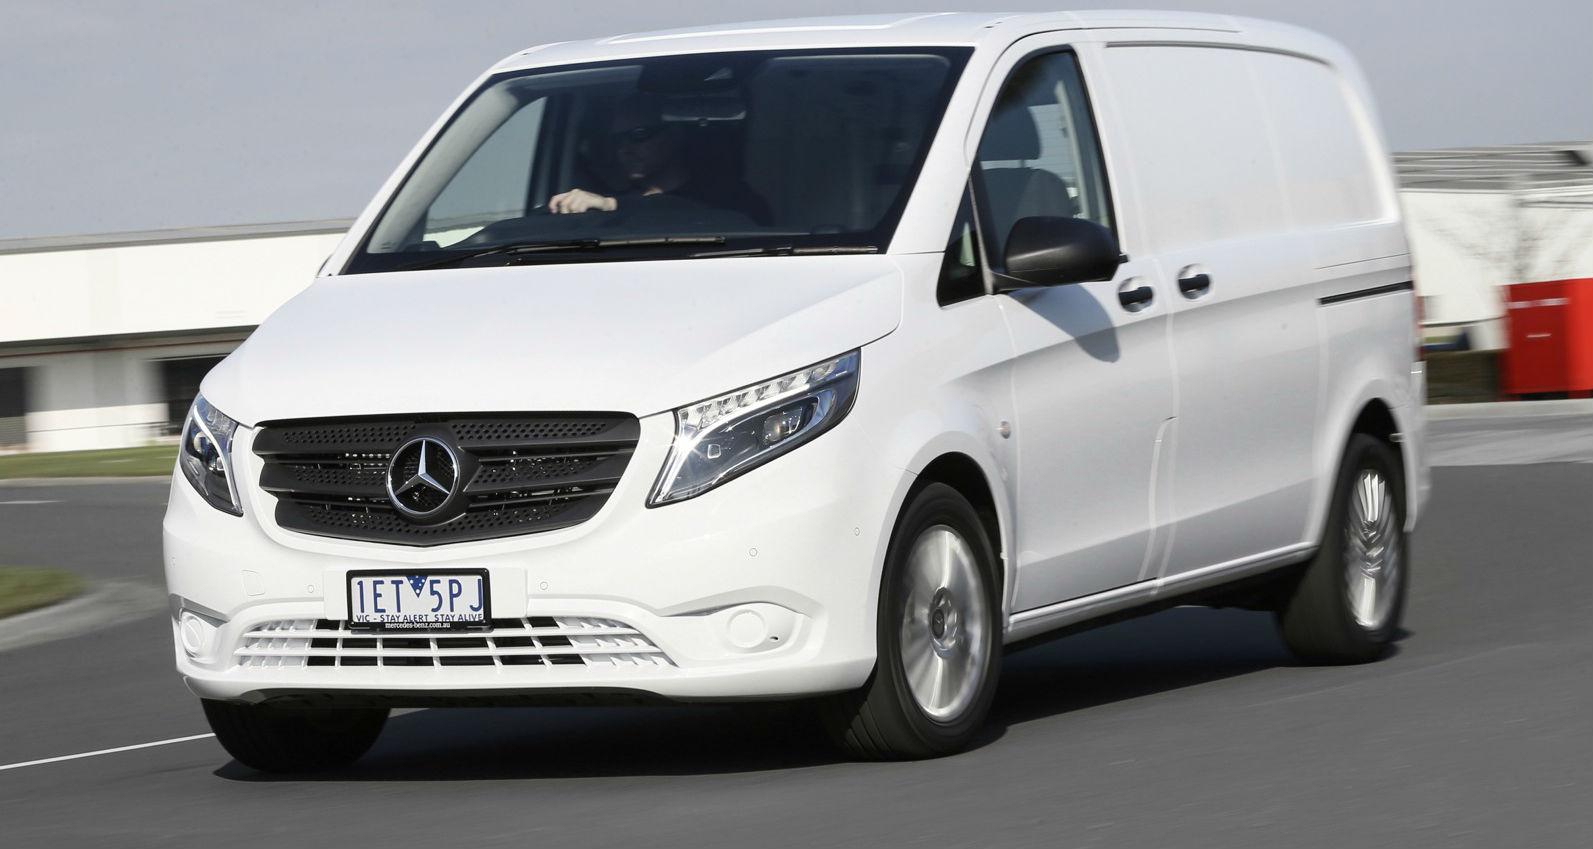 Mercedes-Benz Vito Van Recalled For Potential Fuel Leak